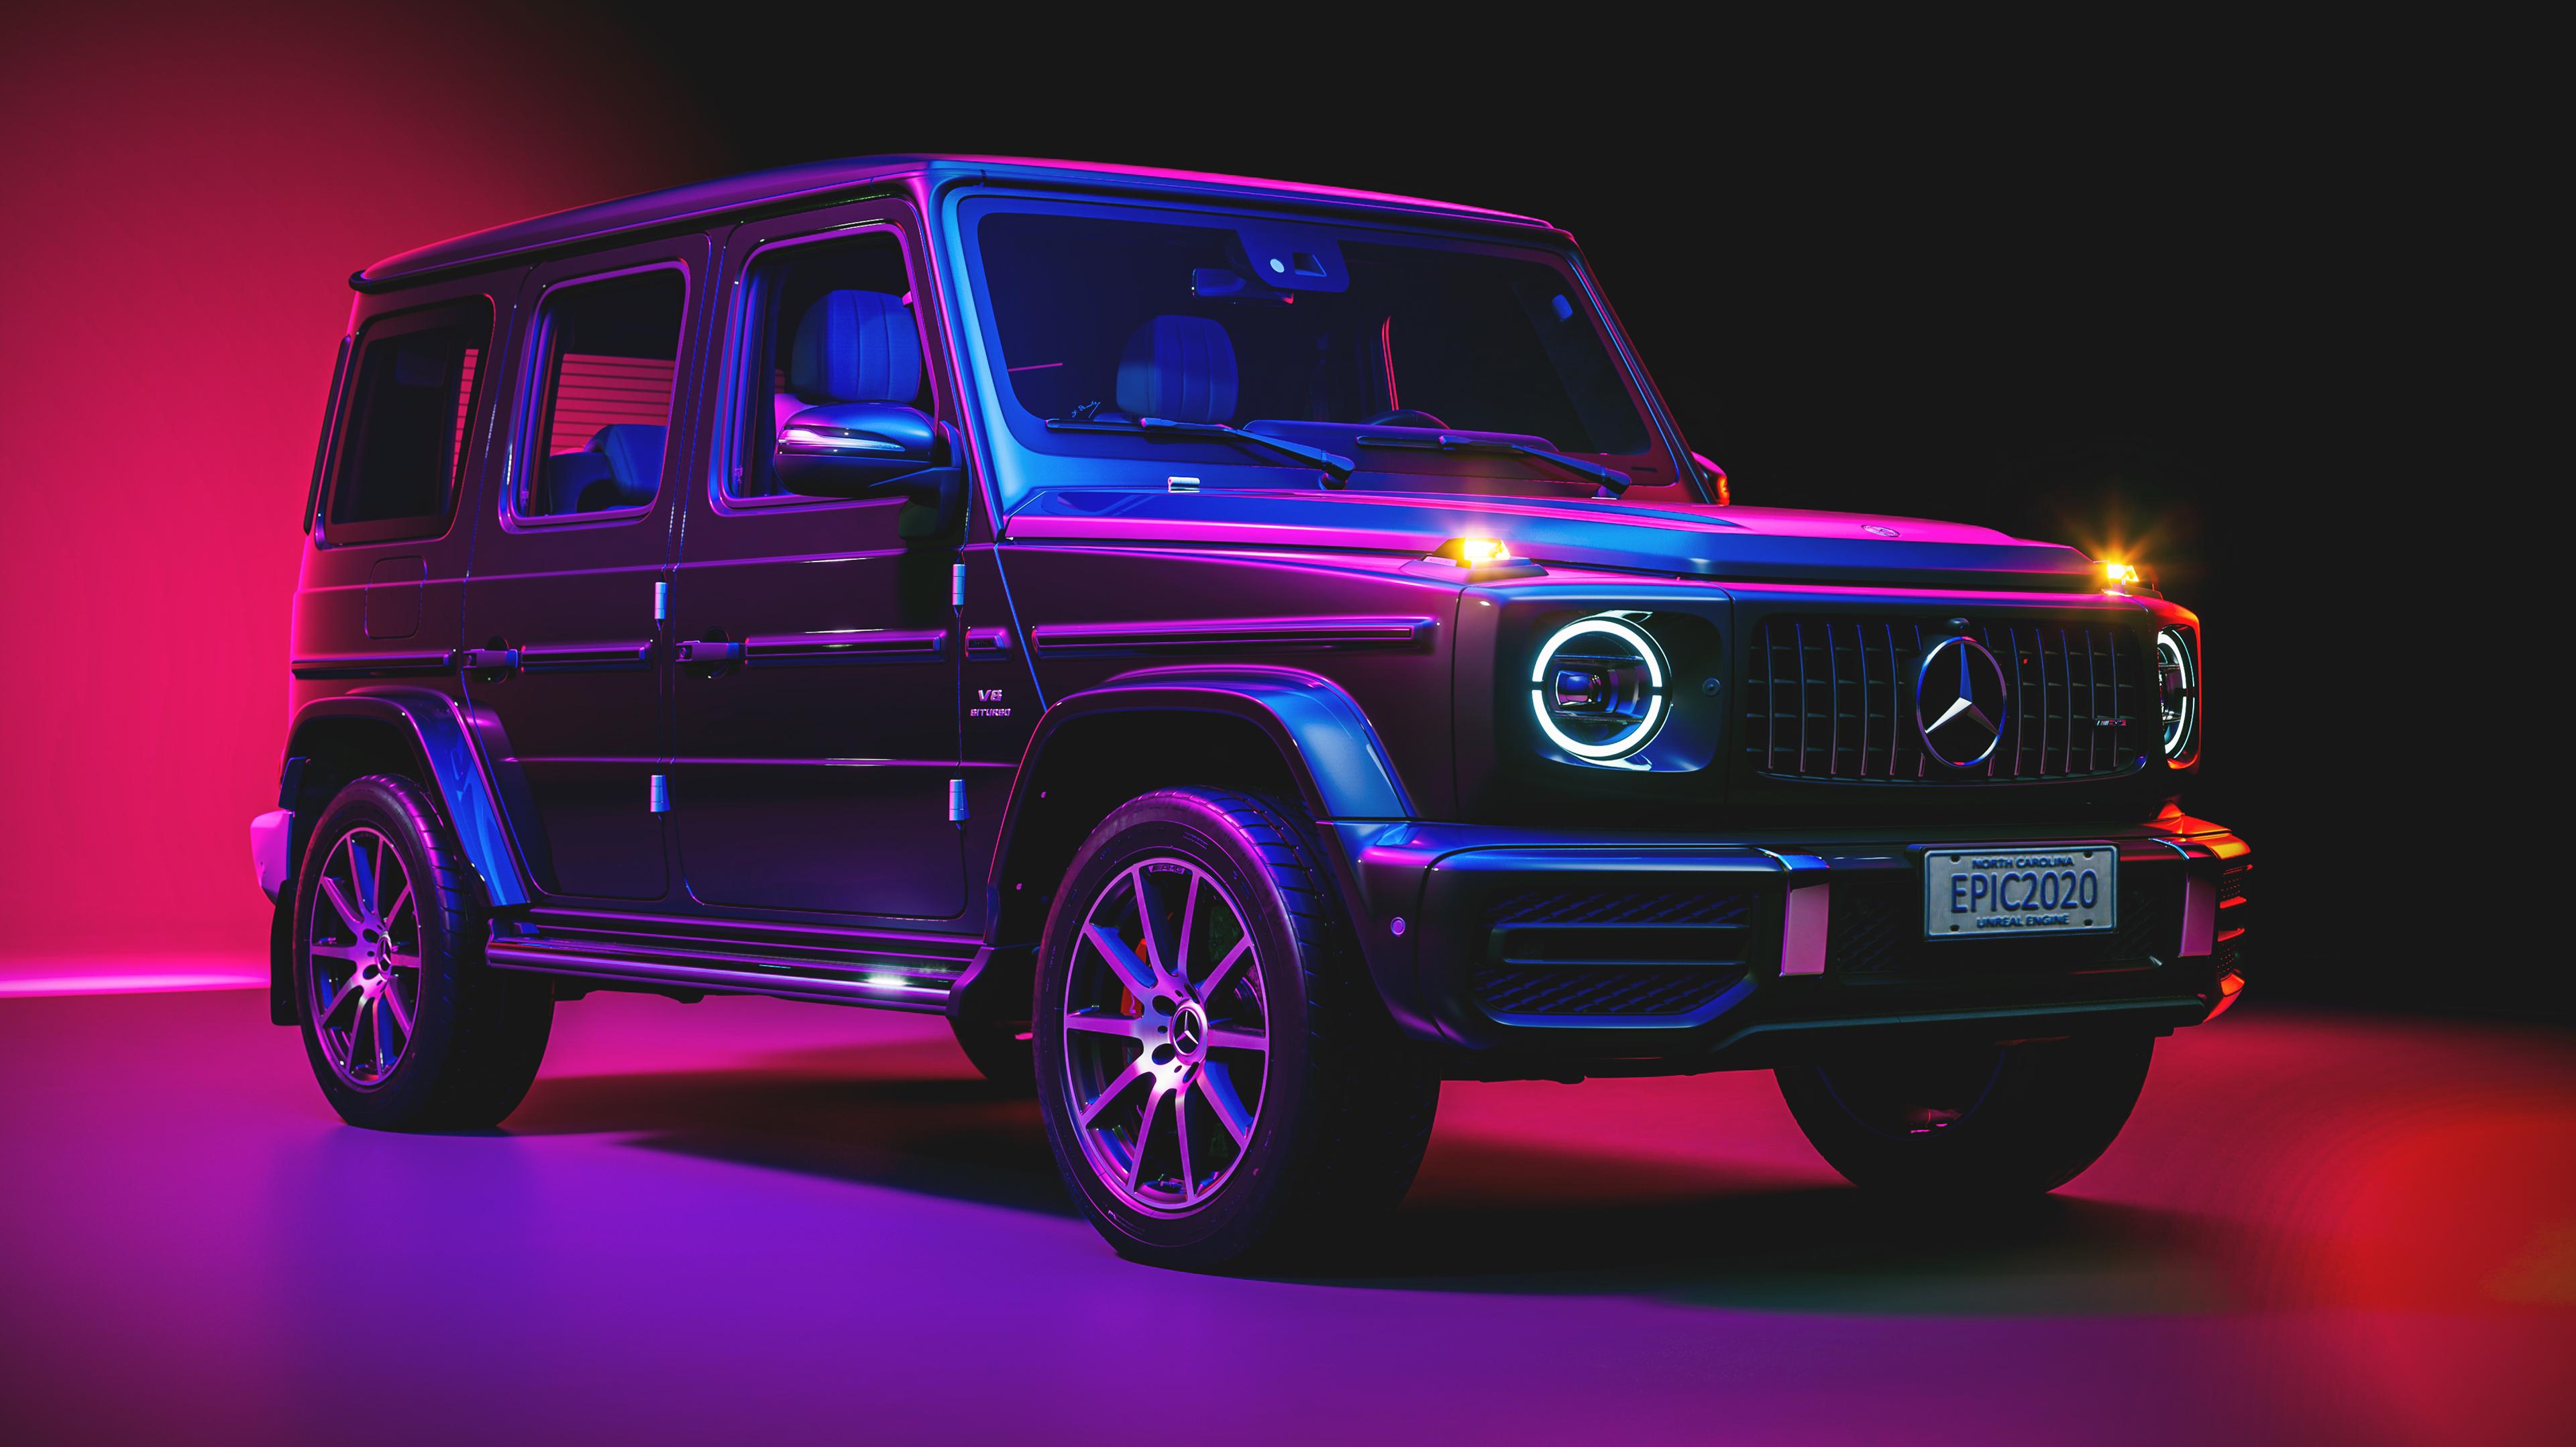 mercedes benz g 63 black 4k 1608910352 - Mercedes Benz G 63 Black 4k - Mercedes Benz G 63 Black 4k wallpapers